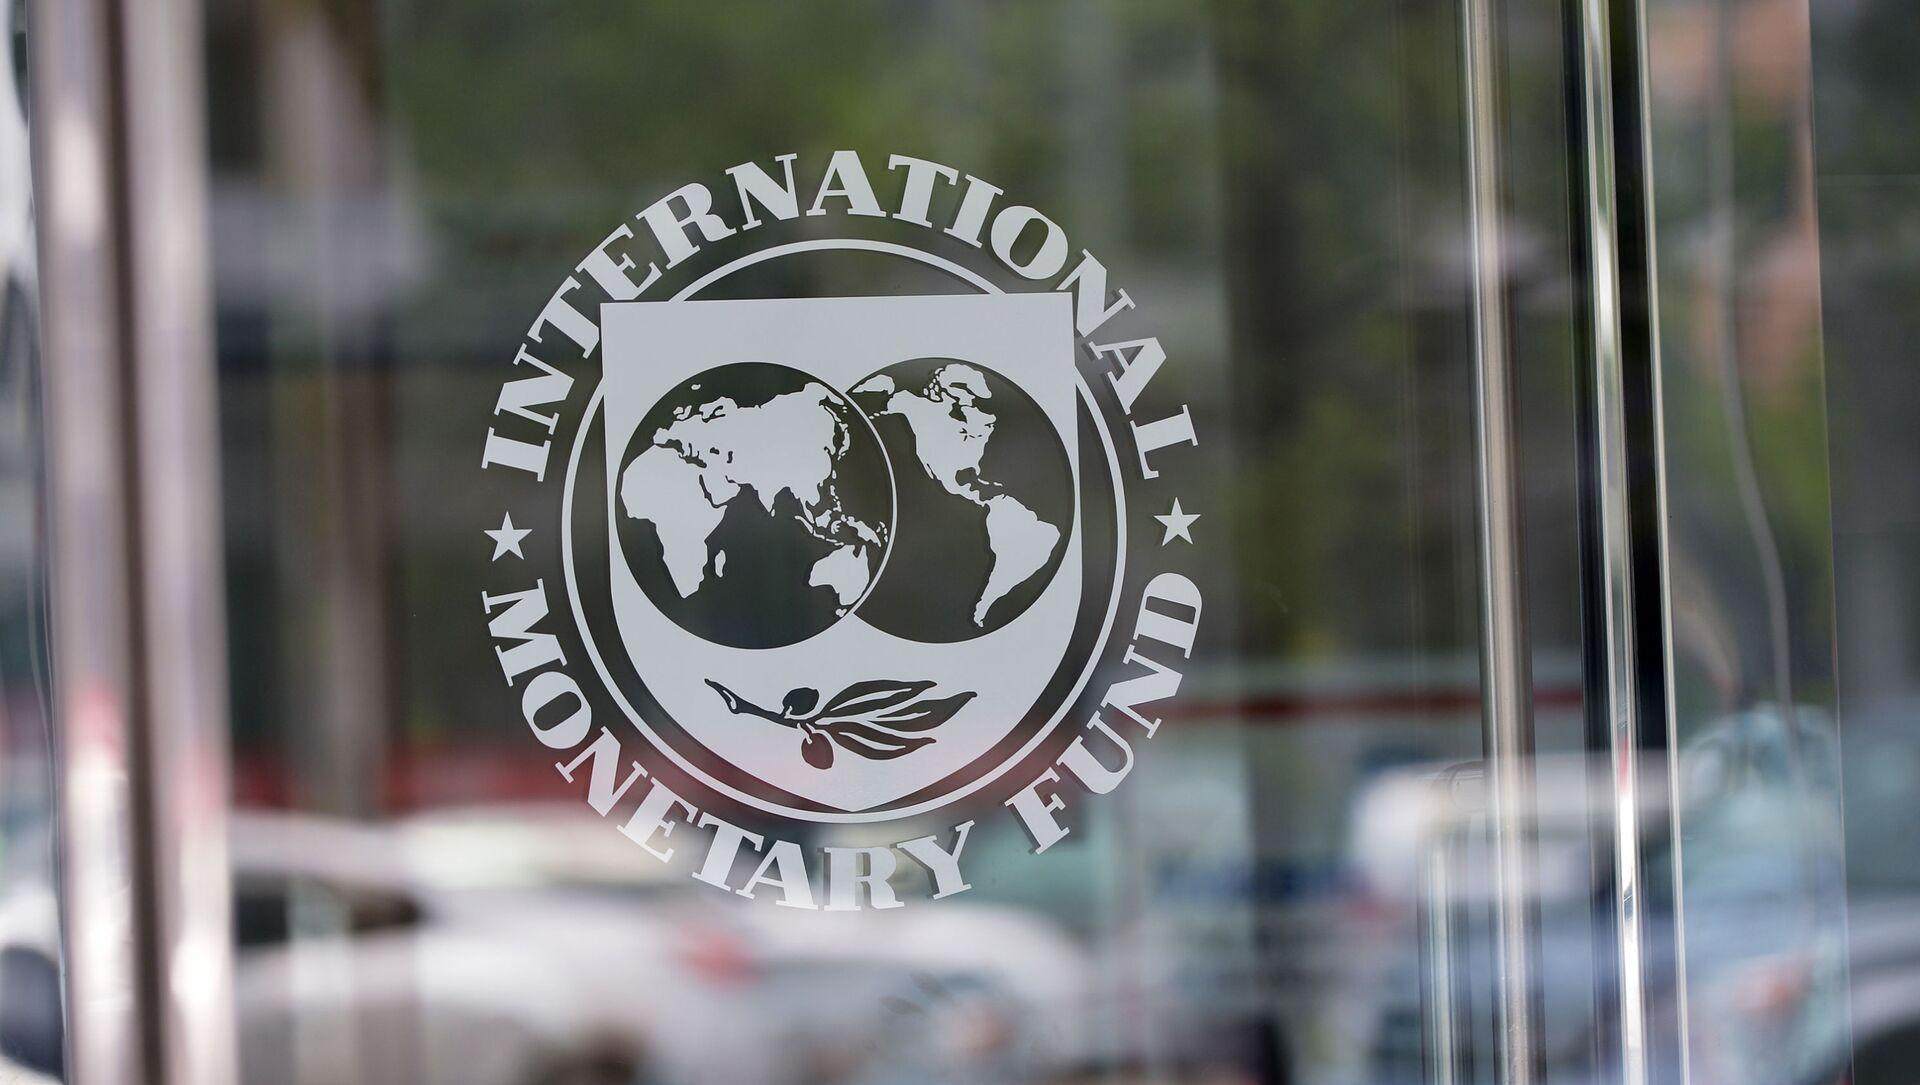 La sede dell'Fmi a Washington - Sputnik Italia, 1920, 03.02.2021